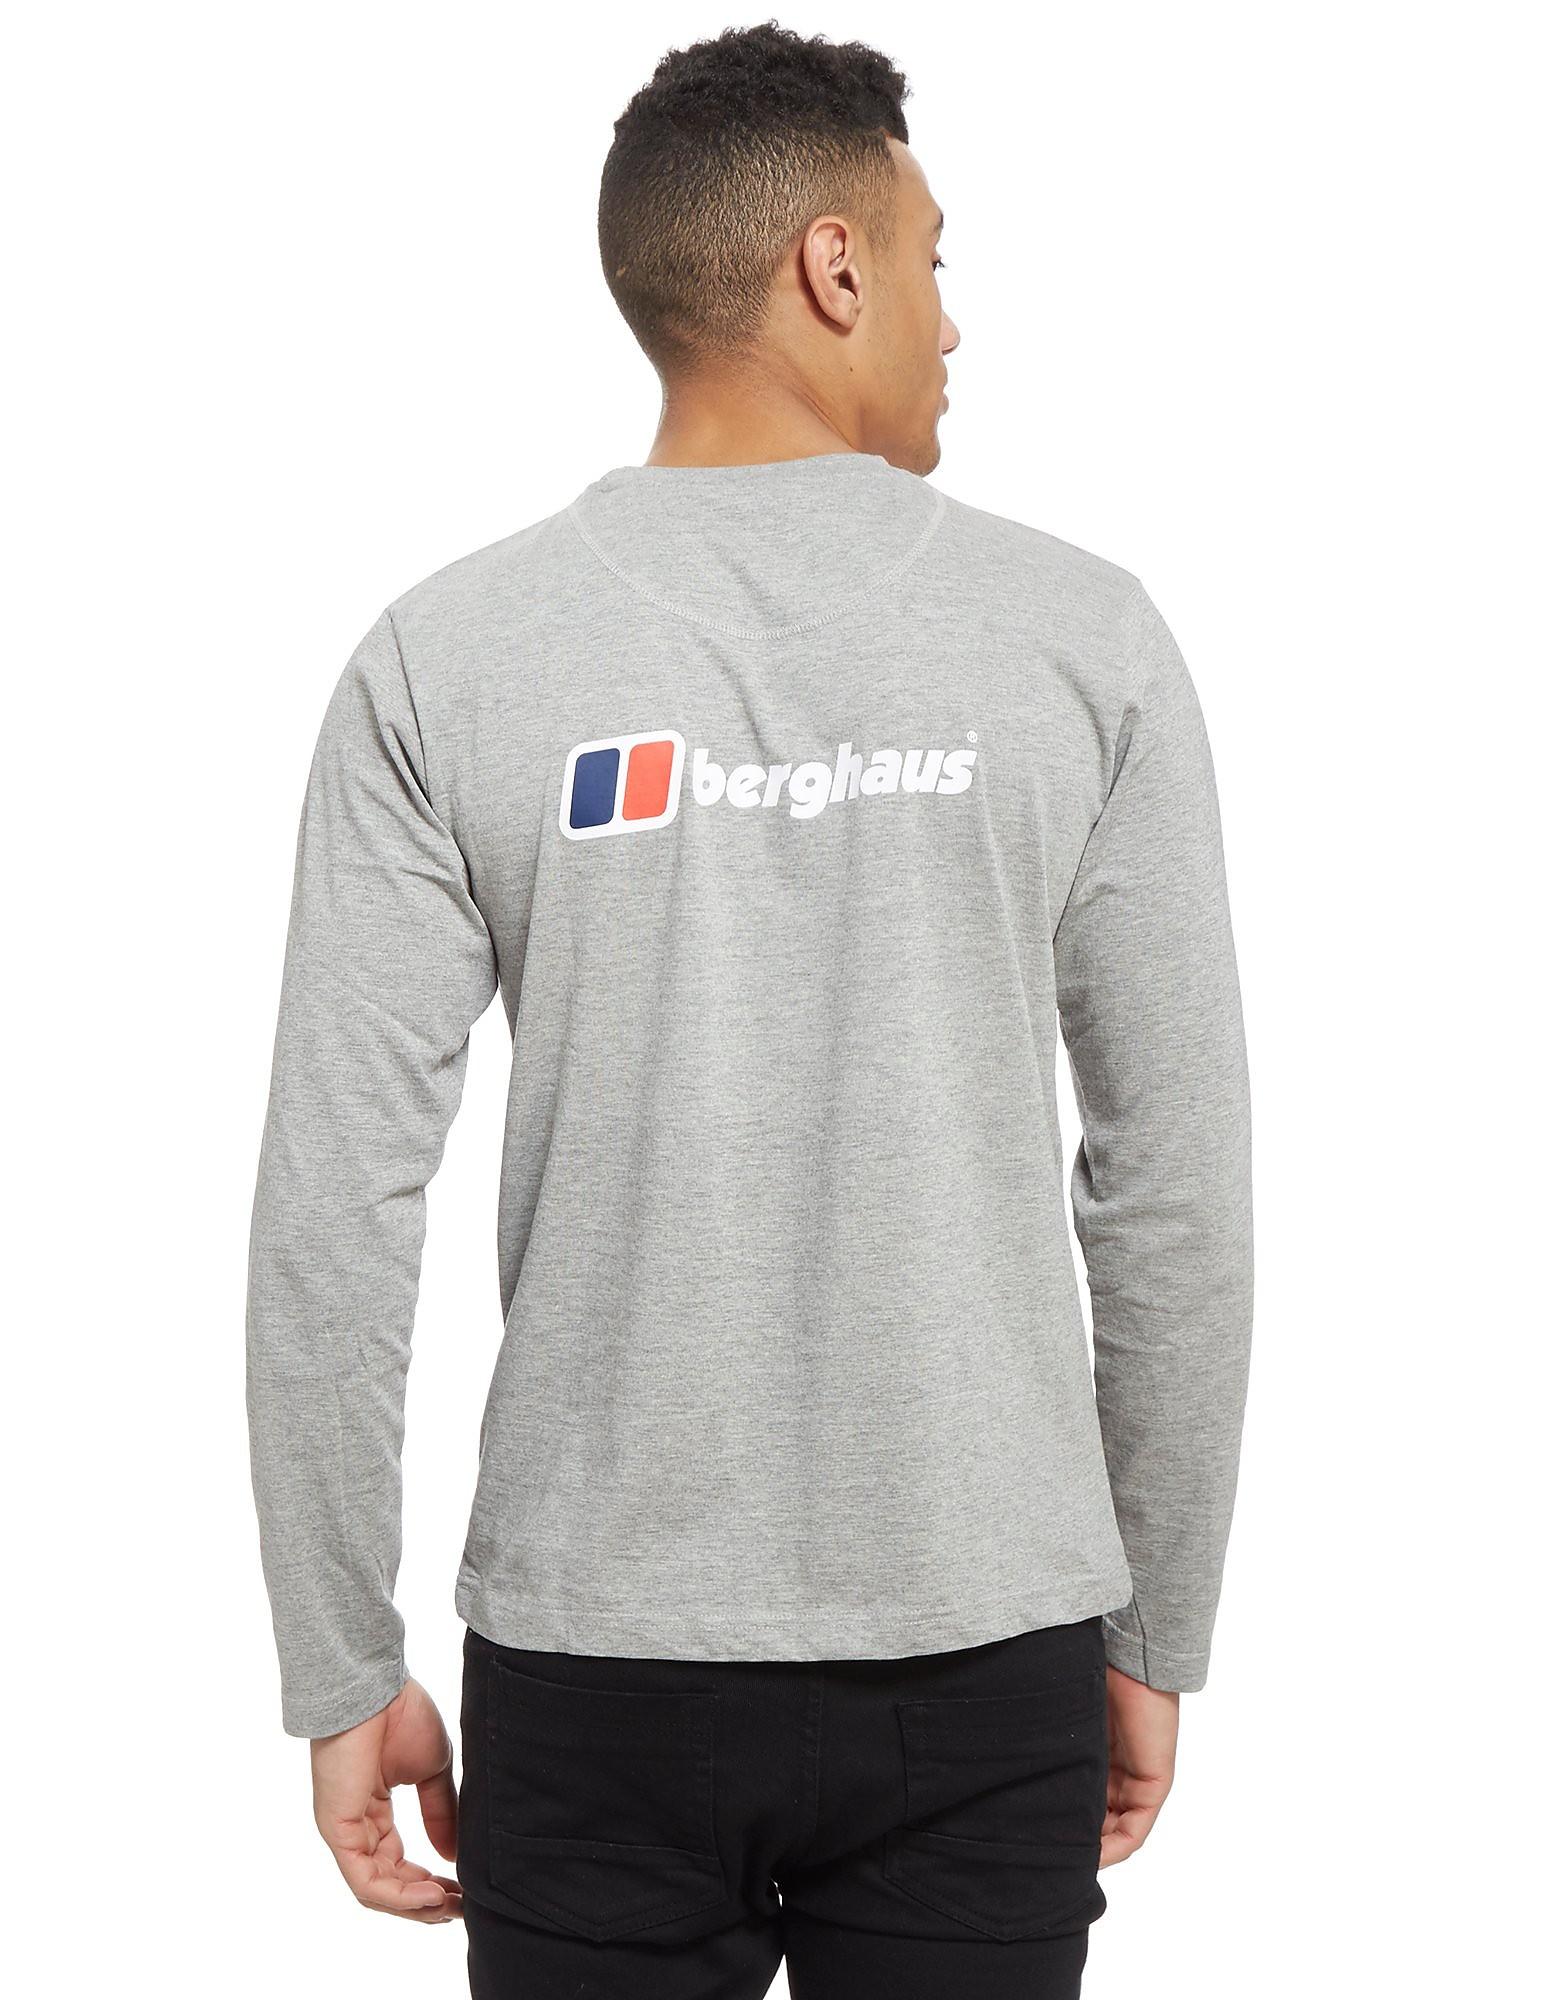 Berghaus Back Logo Long Sleeve T-Shirt